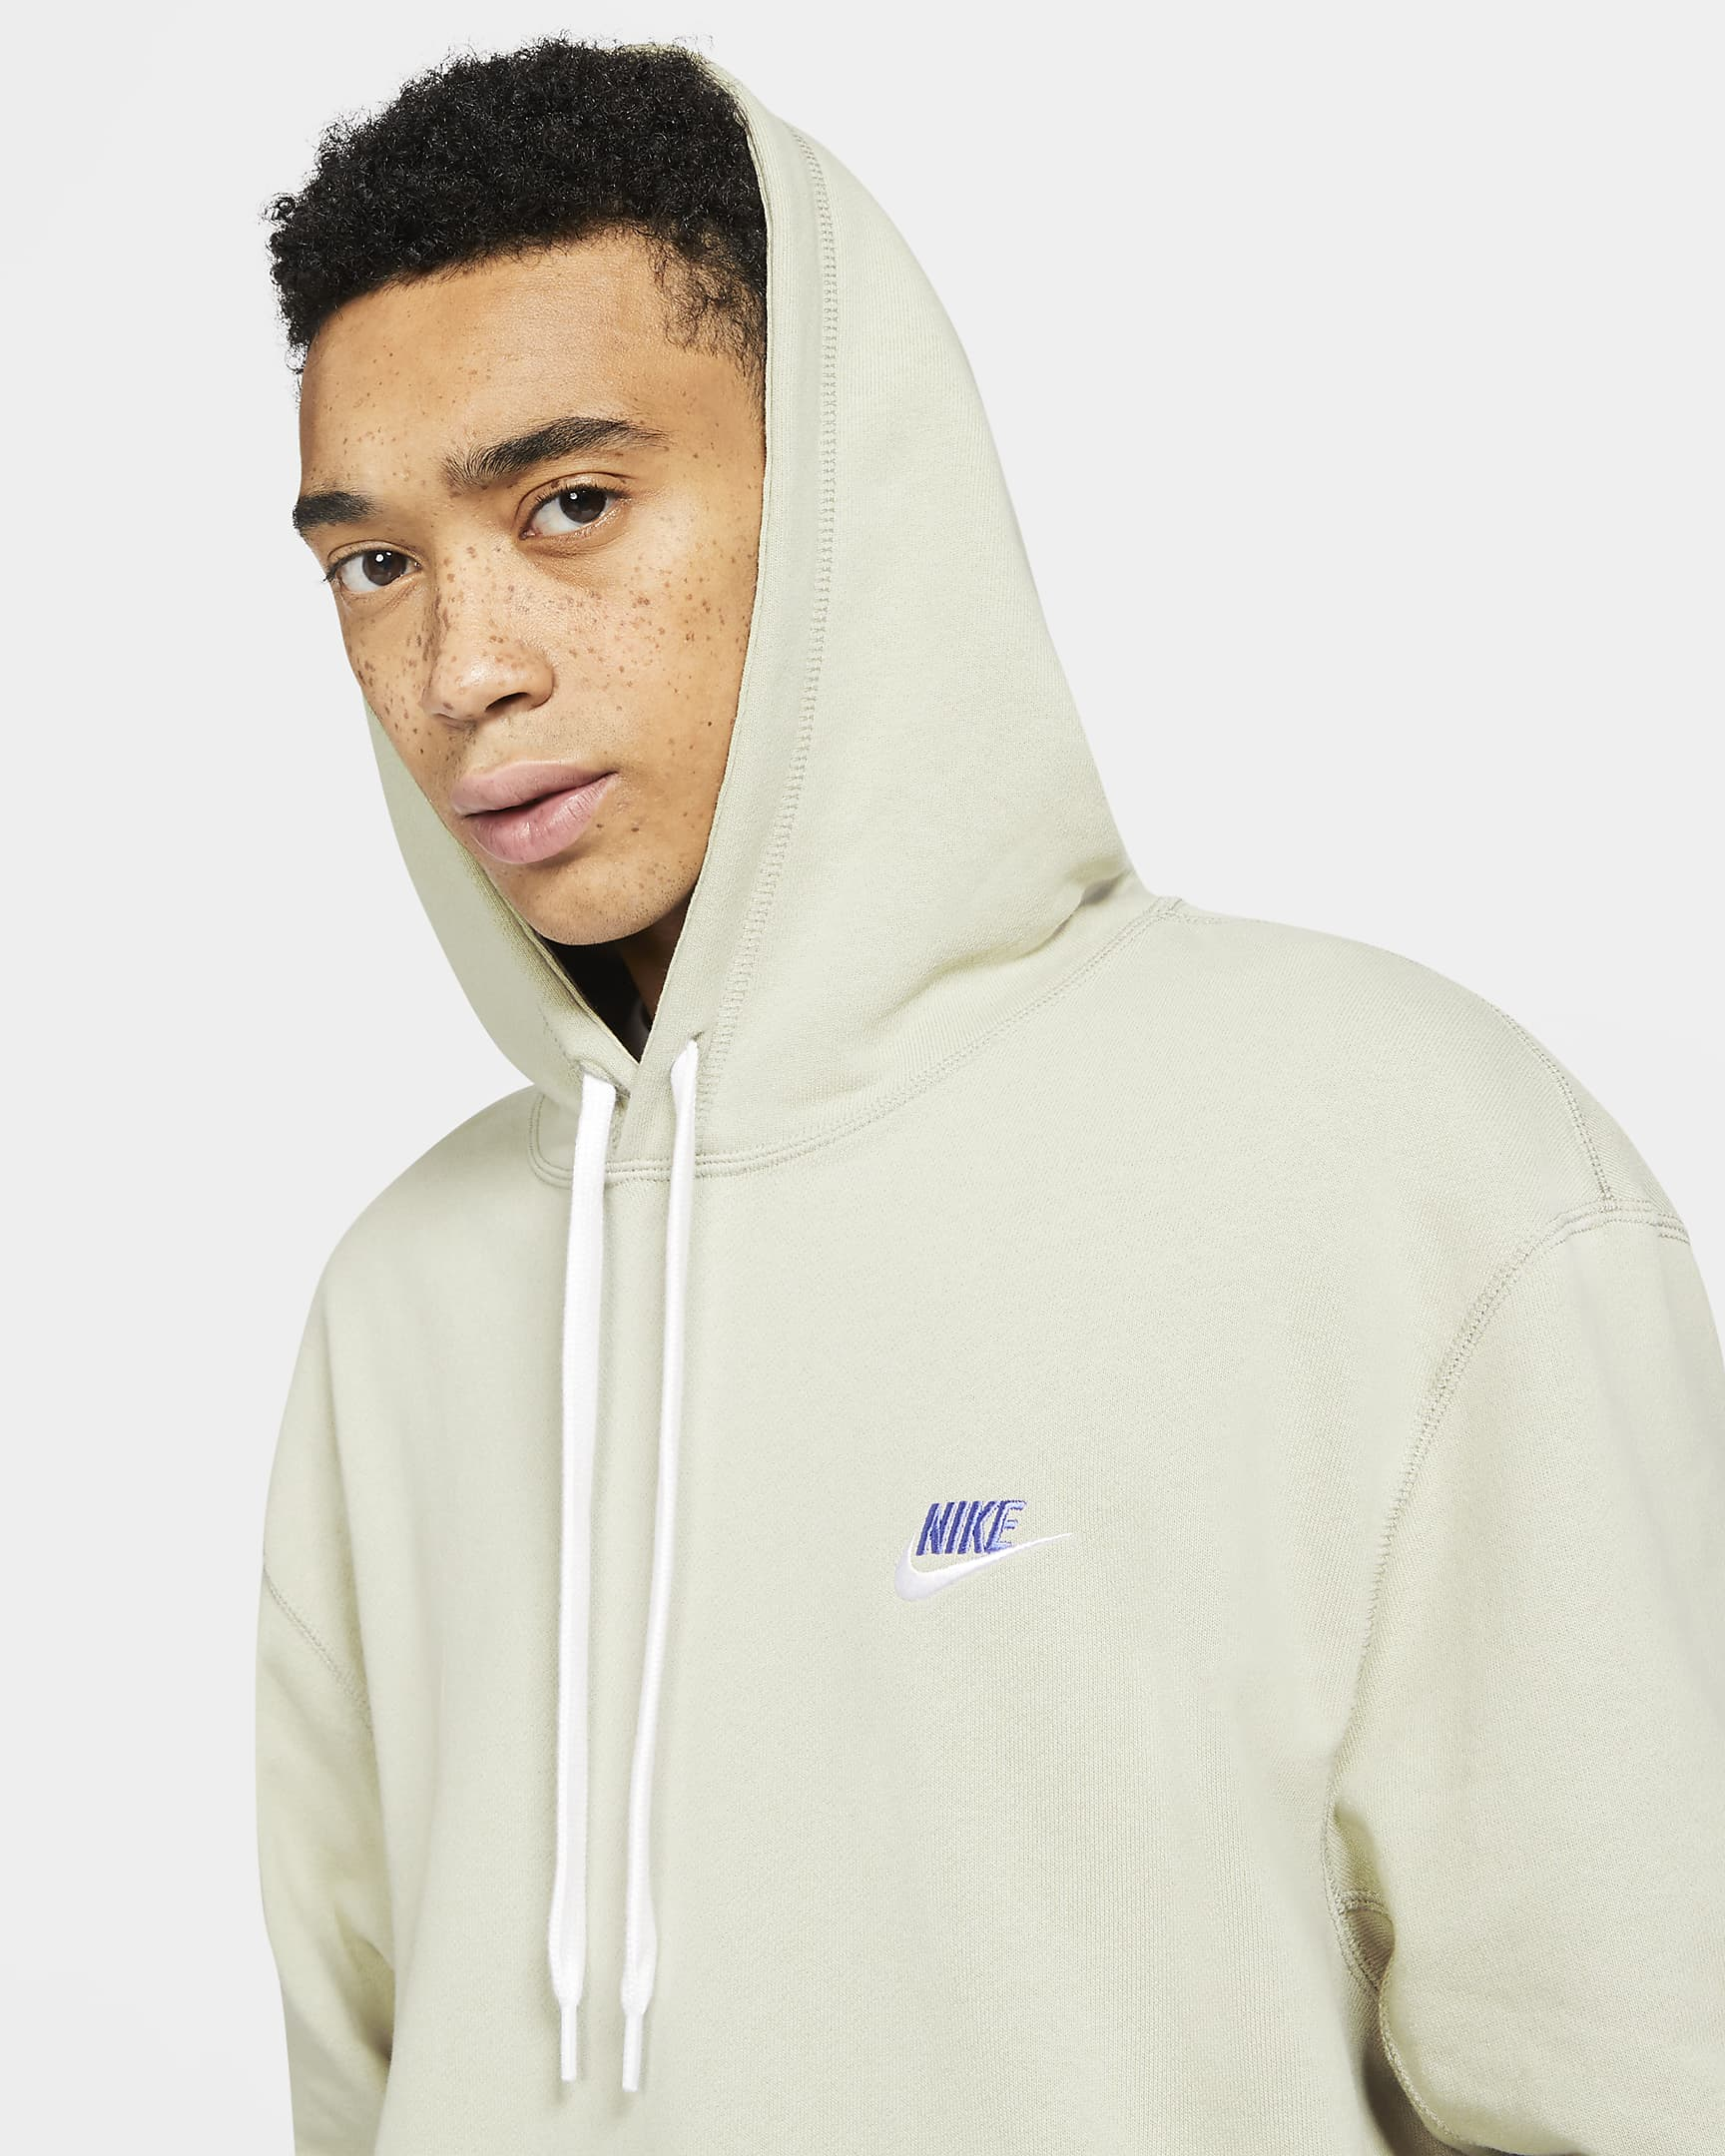 sportswear-mens-classic-fleece-pullover-hoodie-C78SqD